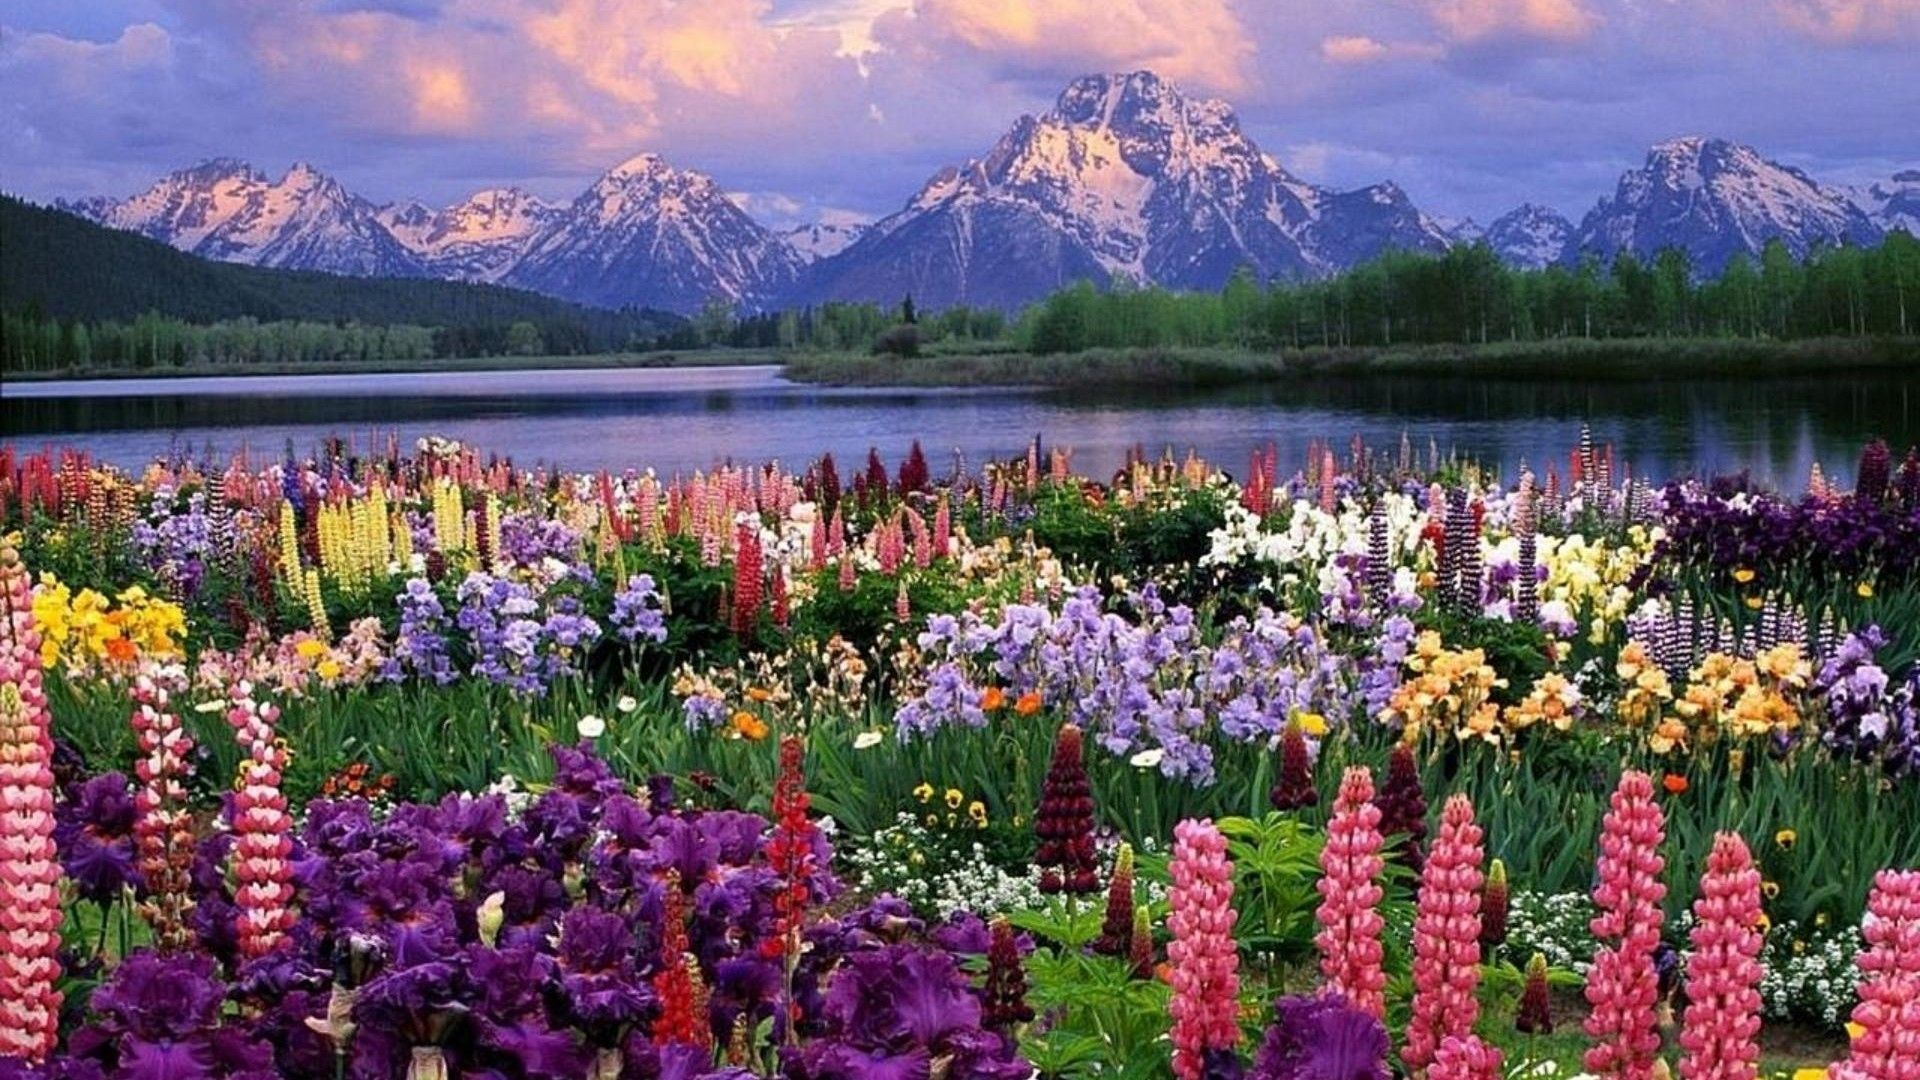 10 Best Spring Pictures For Desktop Full Hd 1920 1080 For Pc Desktop Landscape Wallpaper Spring Desktop Wallpaper Spring Wallpaper